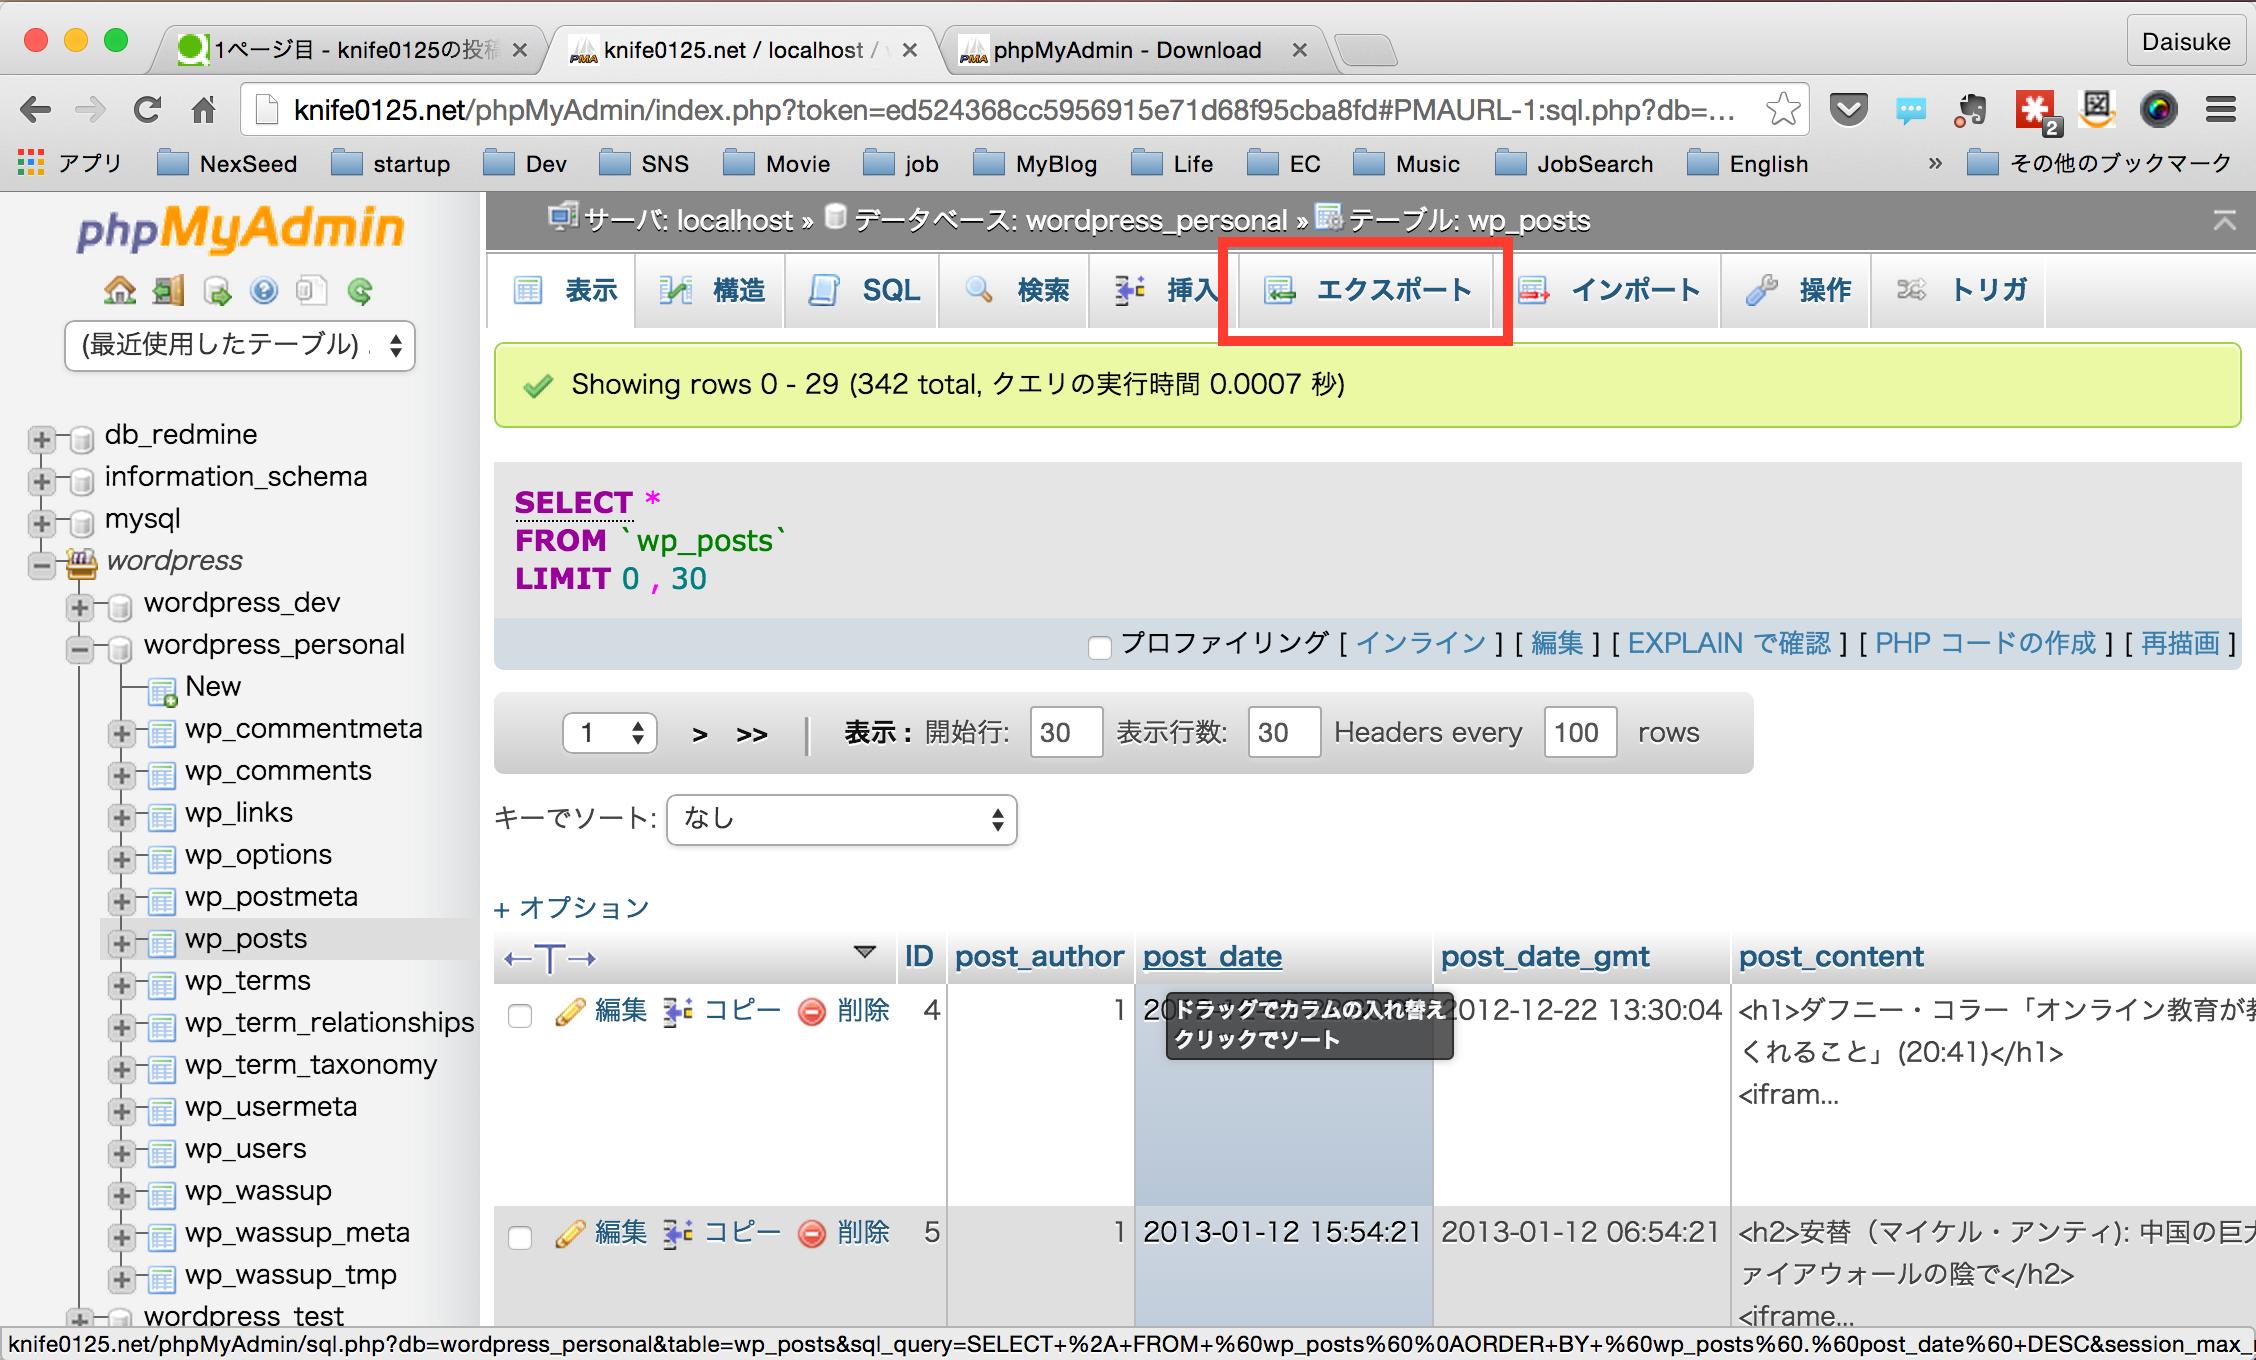 PHPMyAdmin_Export_04.png